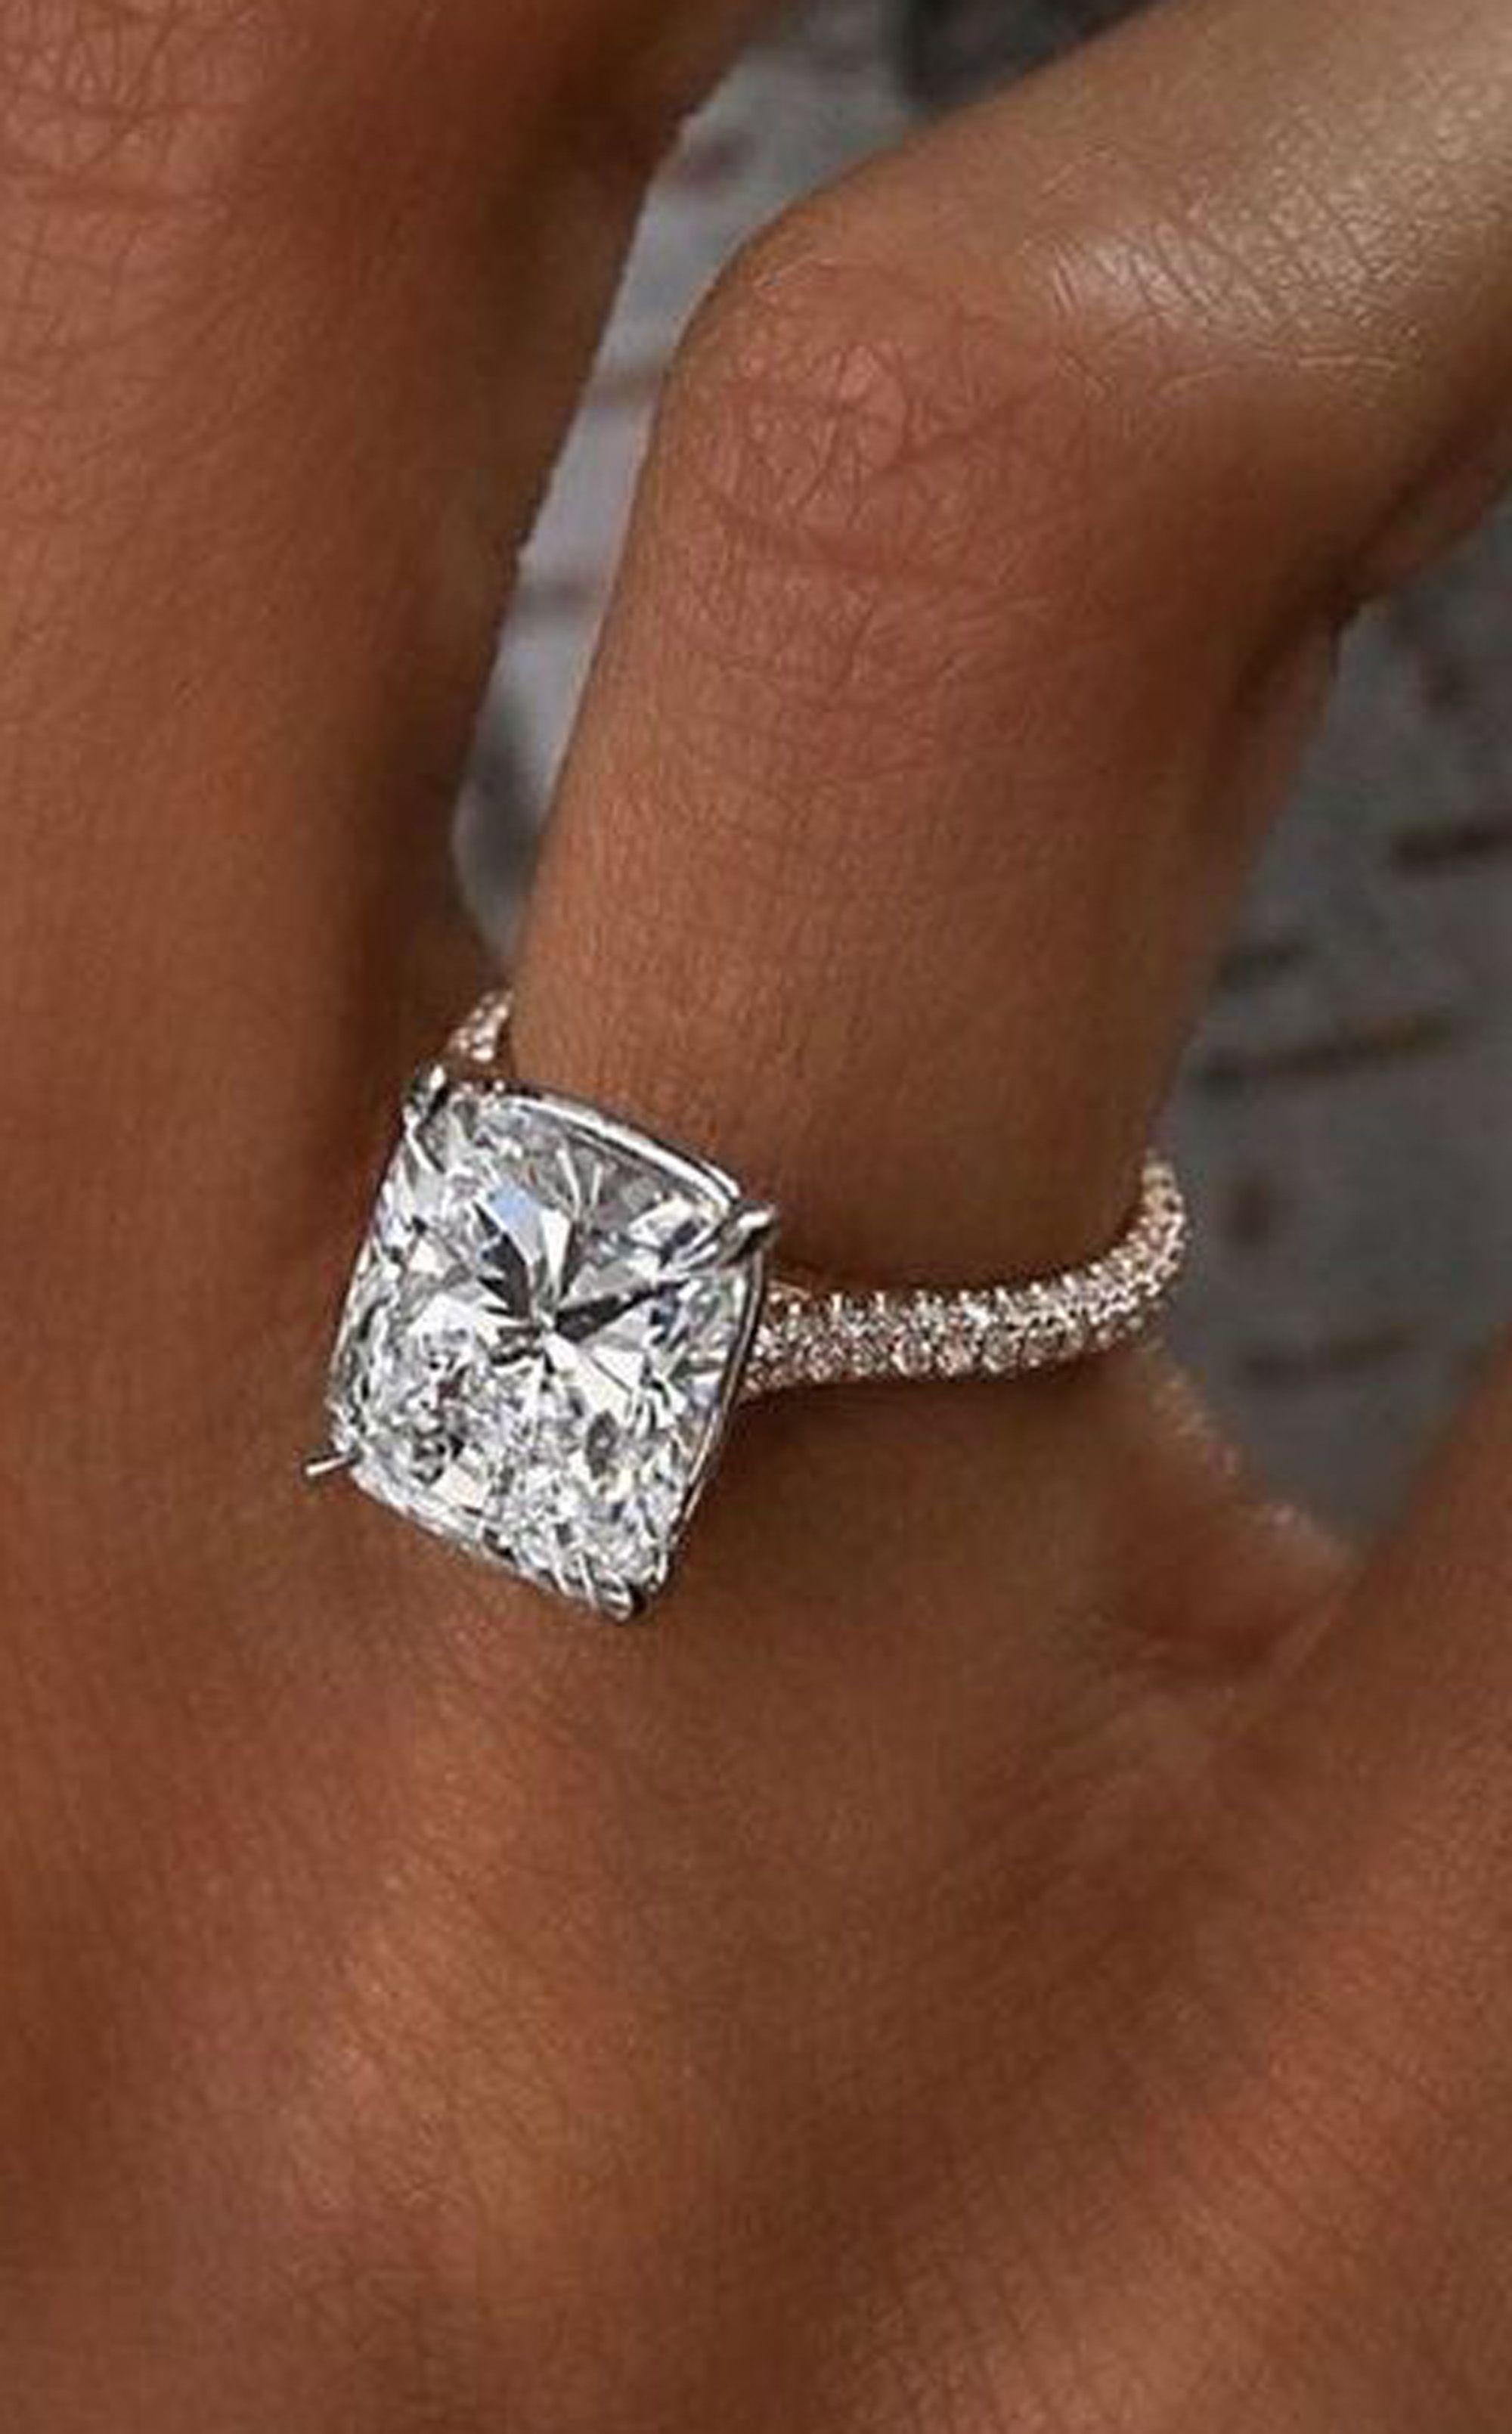 Large Silver Natural Gemstone Moonstone Ring Wedding Engagement Jewelry 5-10